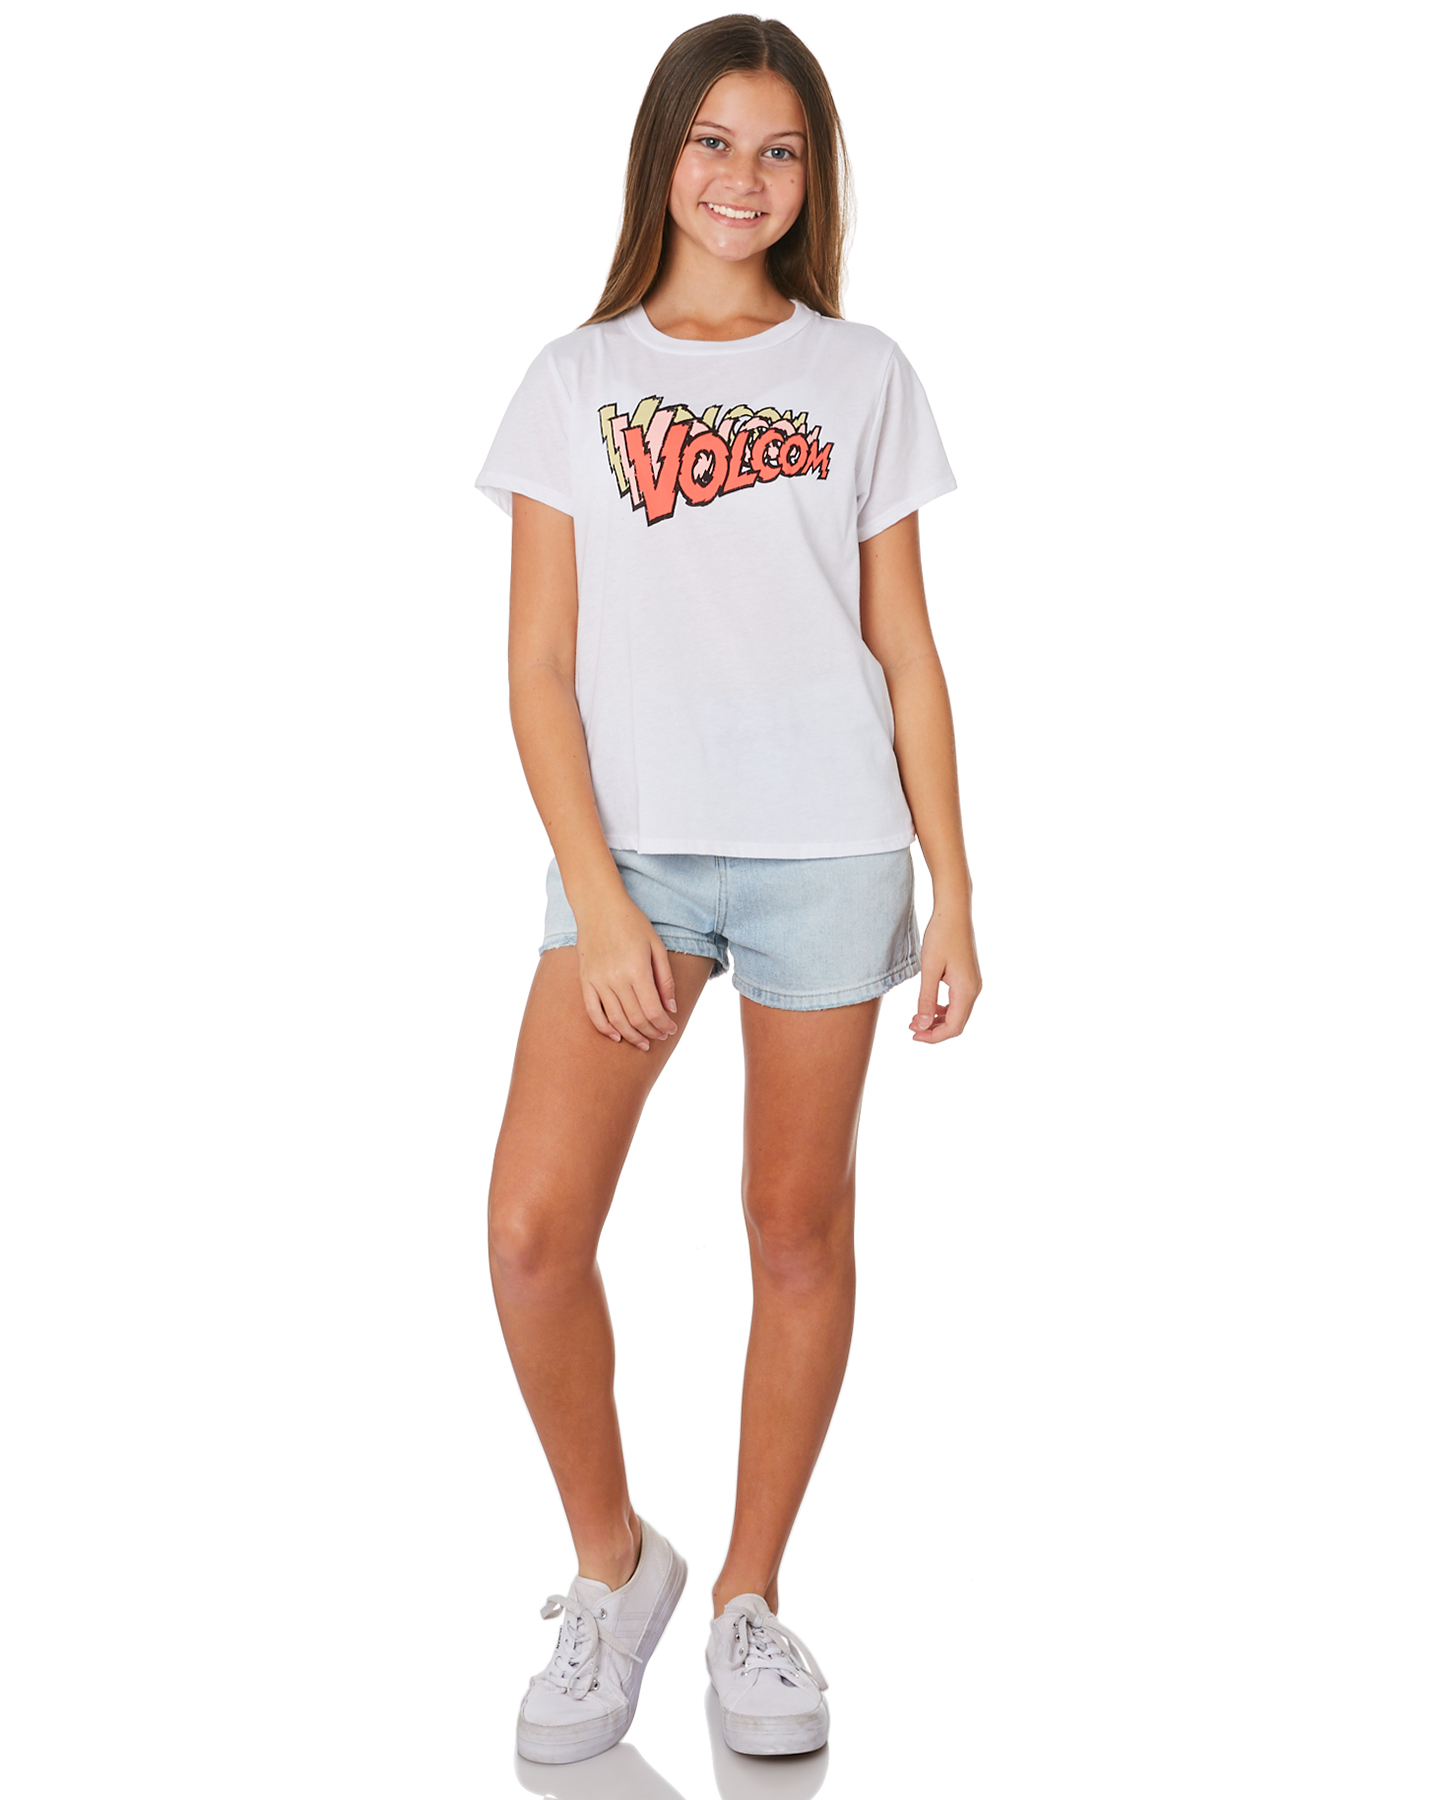 New-Volcom-Girls-Girls-Last-Party-Tee-Teens-White thumbnail 15